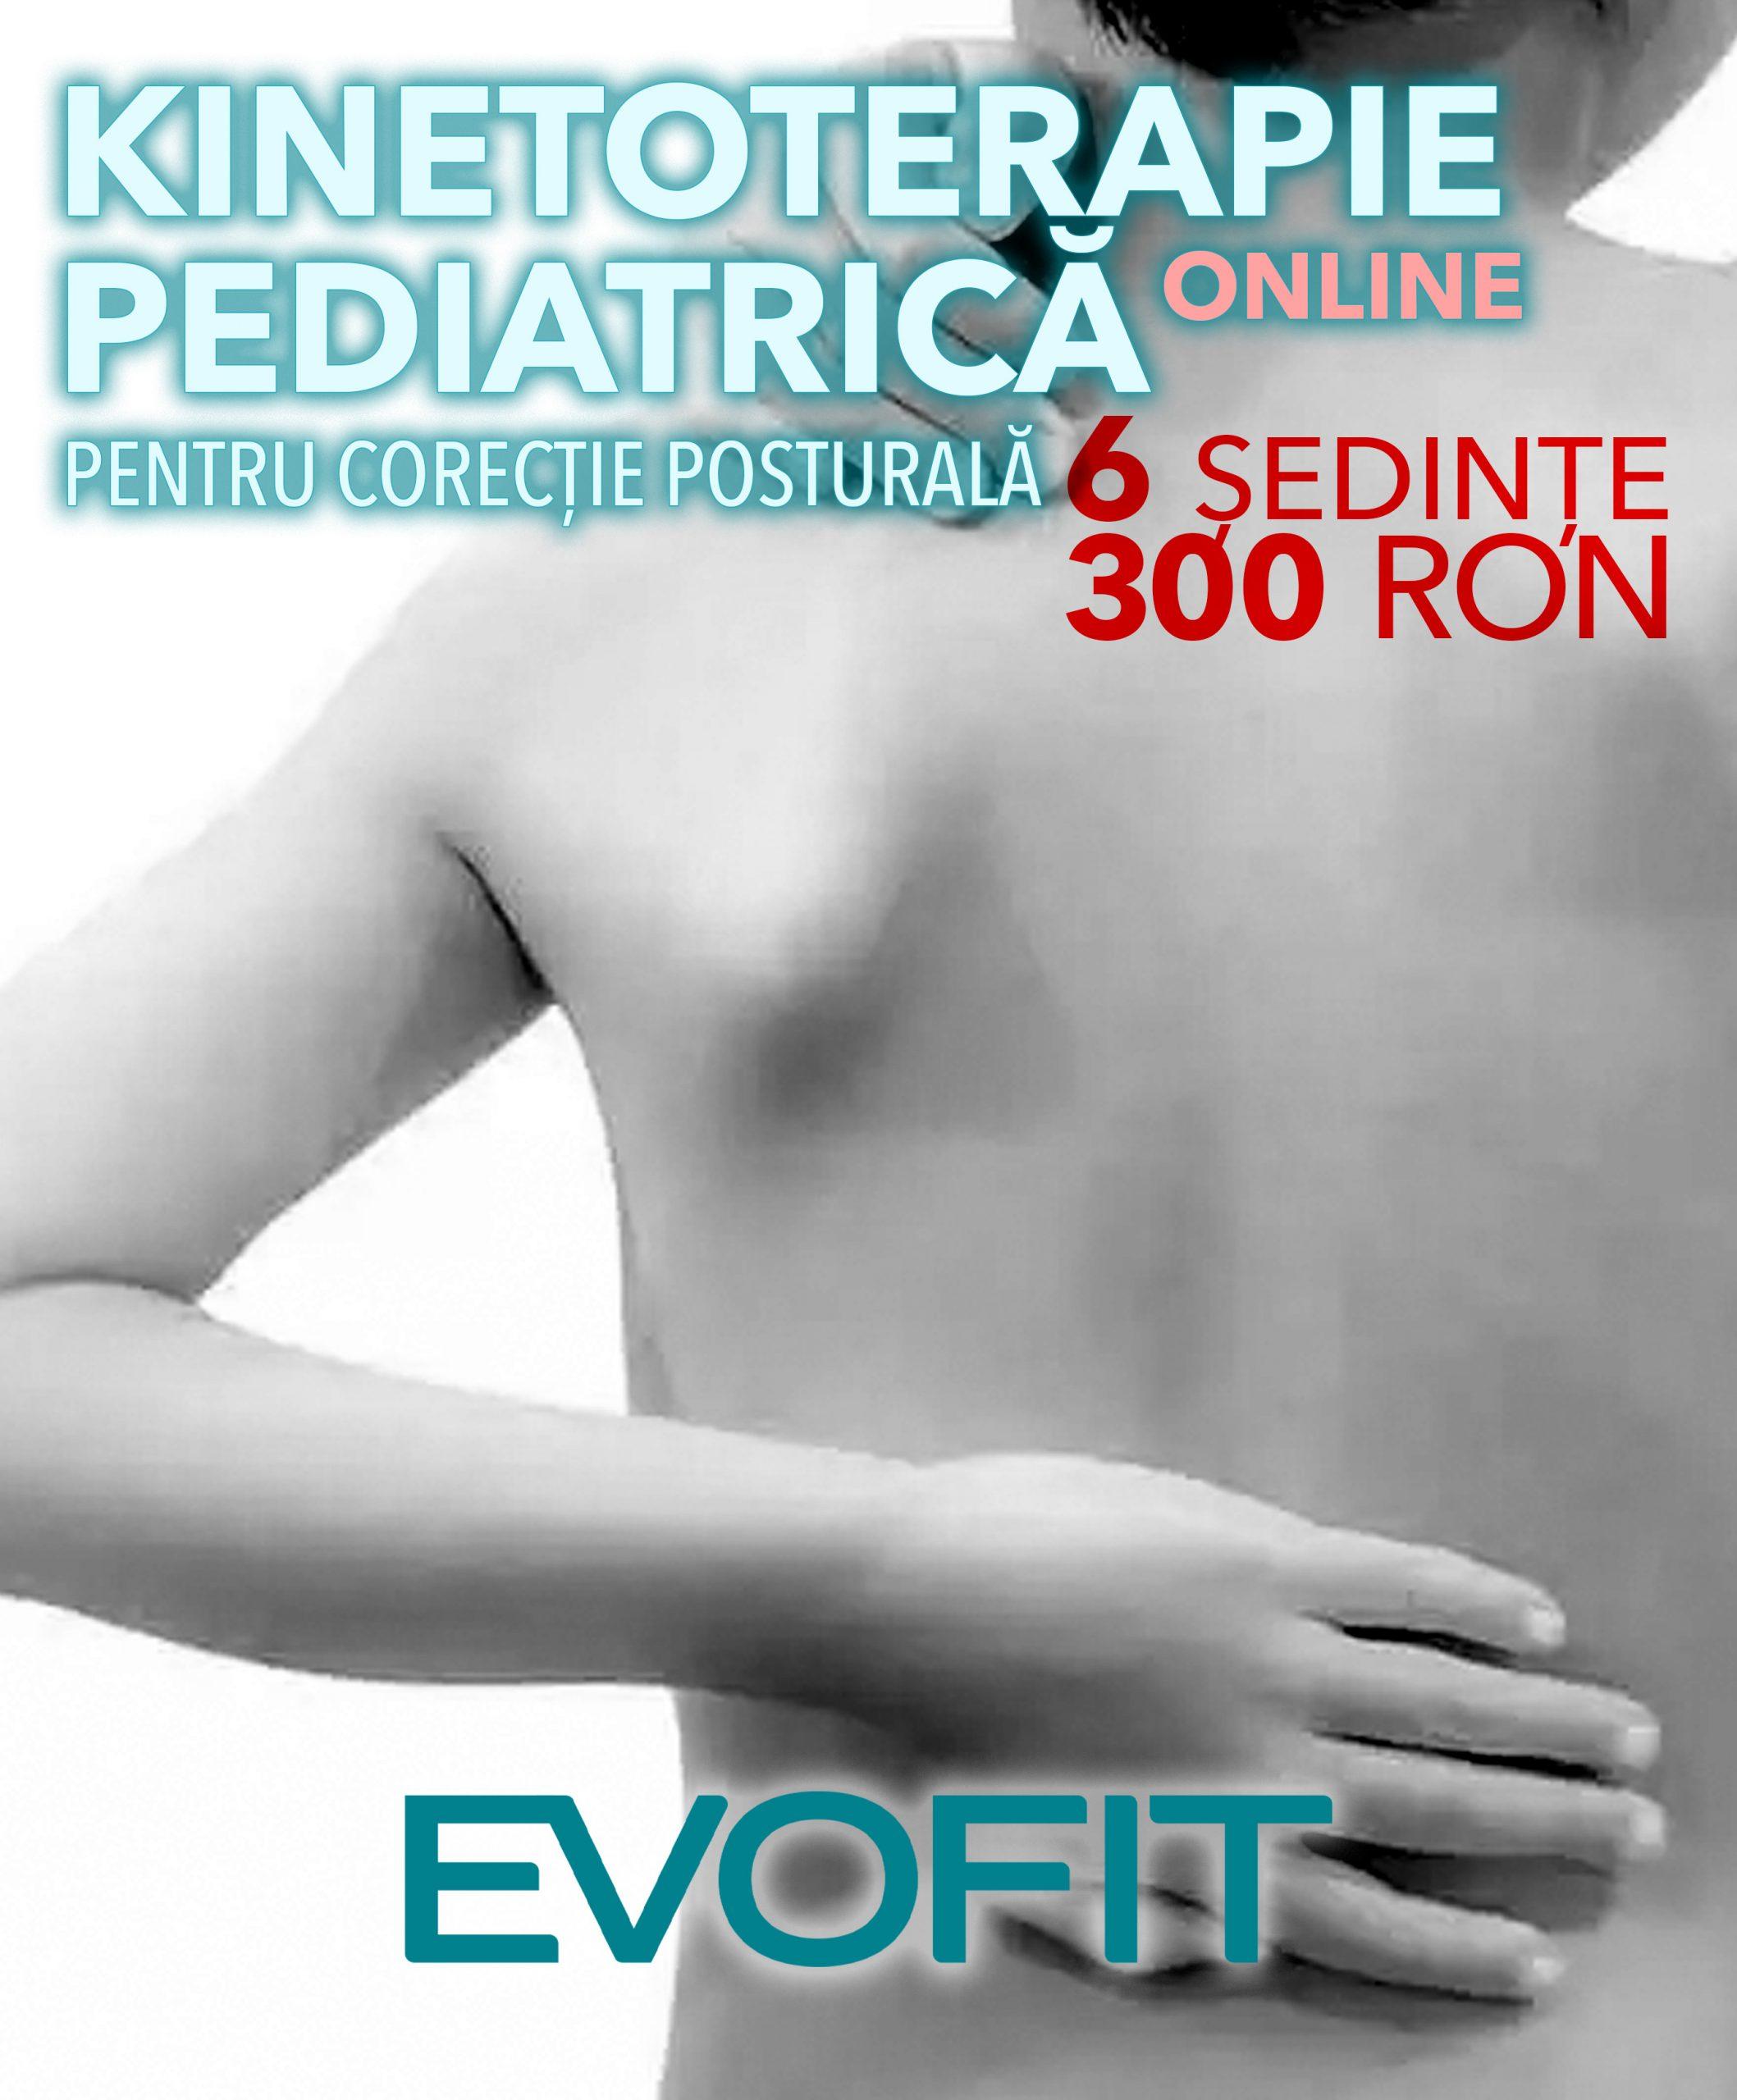 kinetoterapie-copii-2